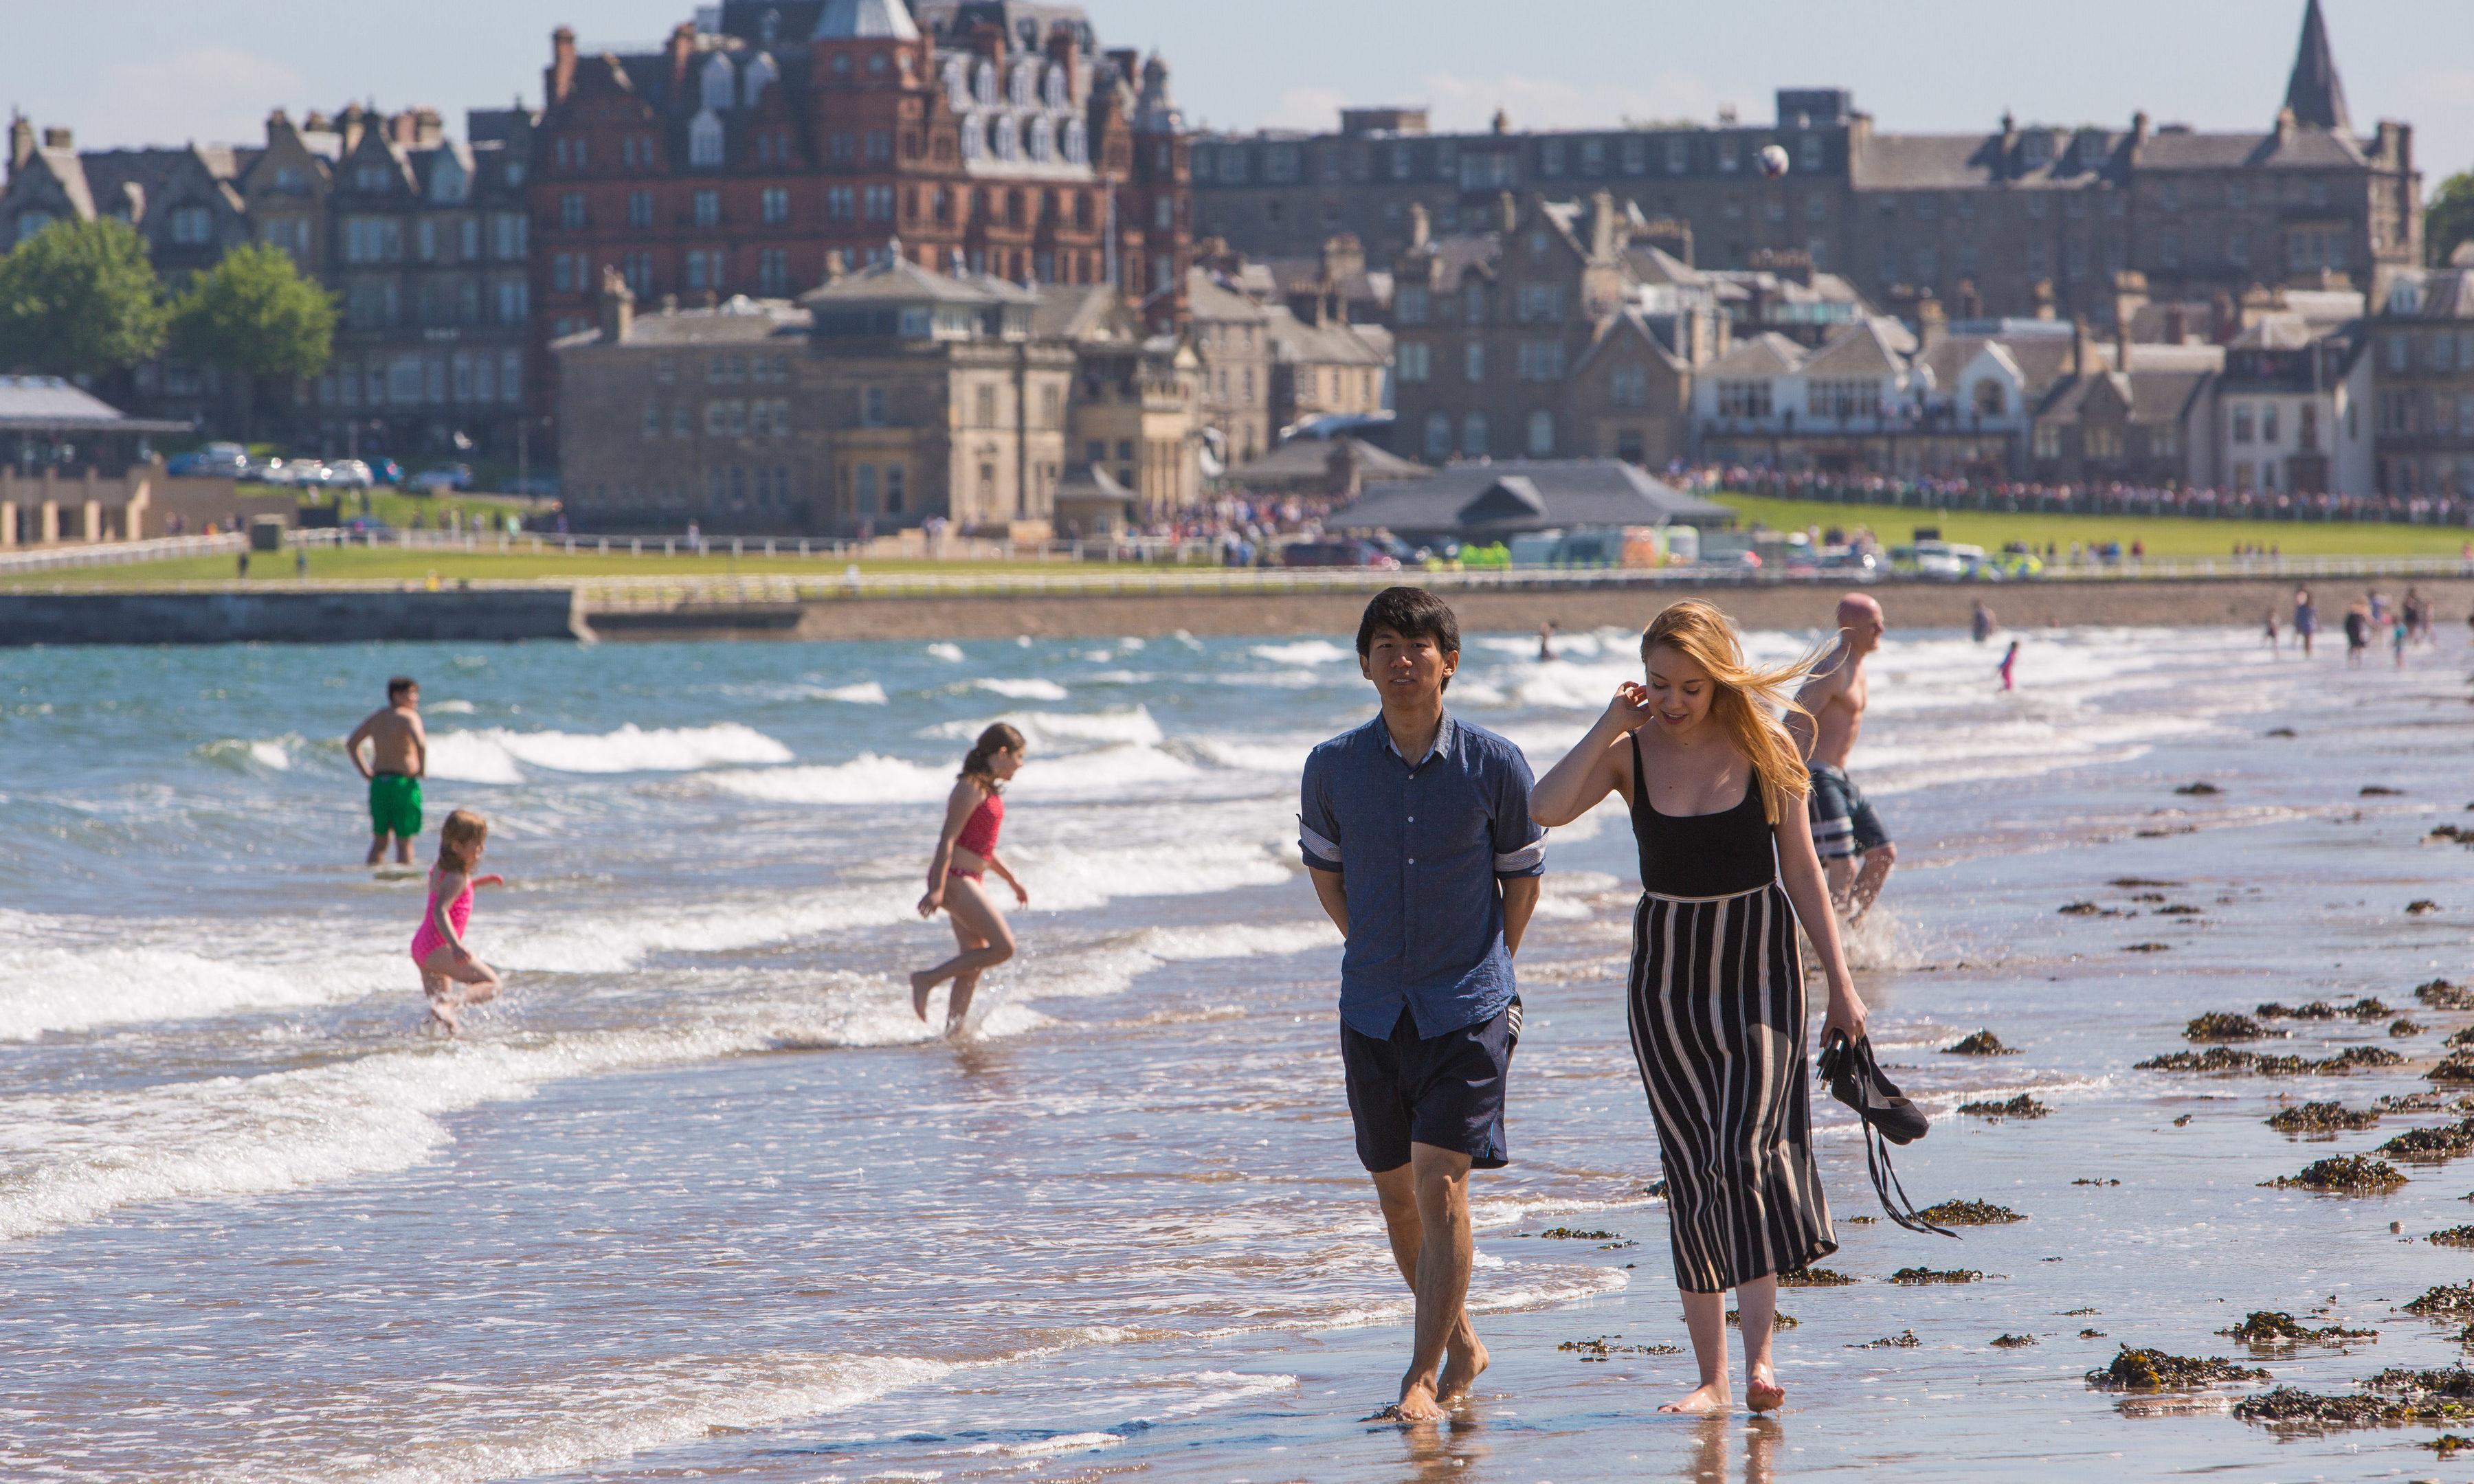 Locals enjoy the heatwave in St Andrews in May 2017.